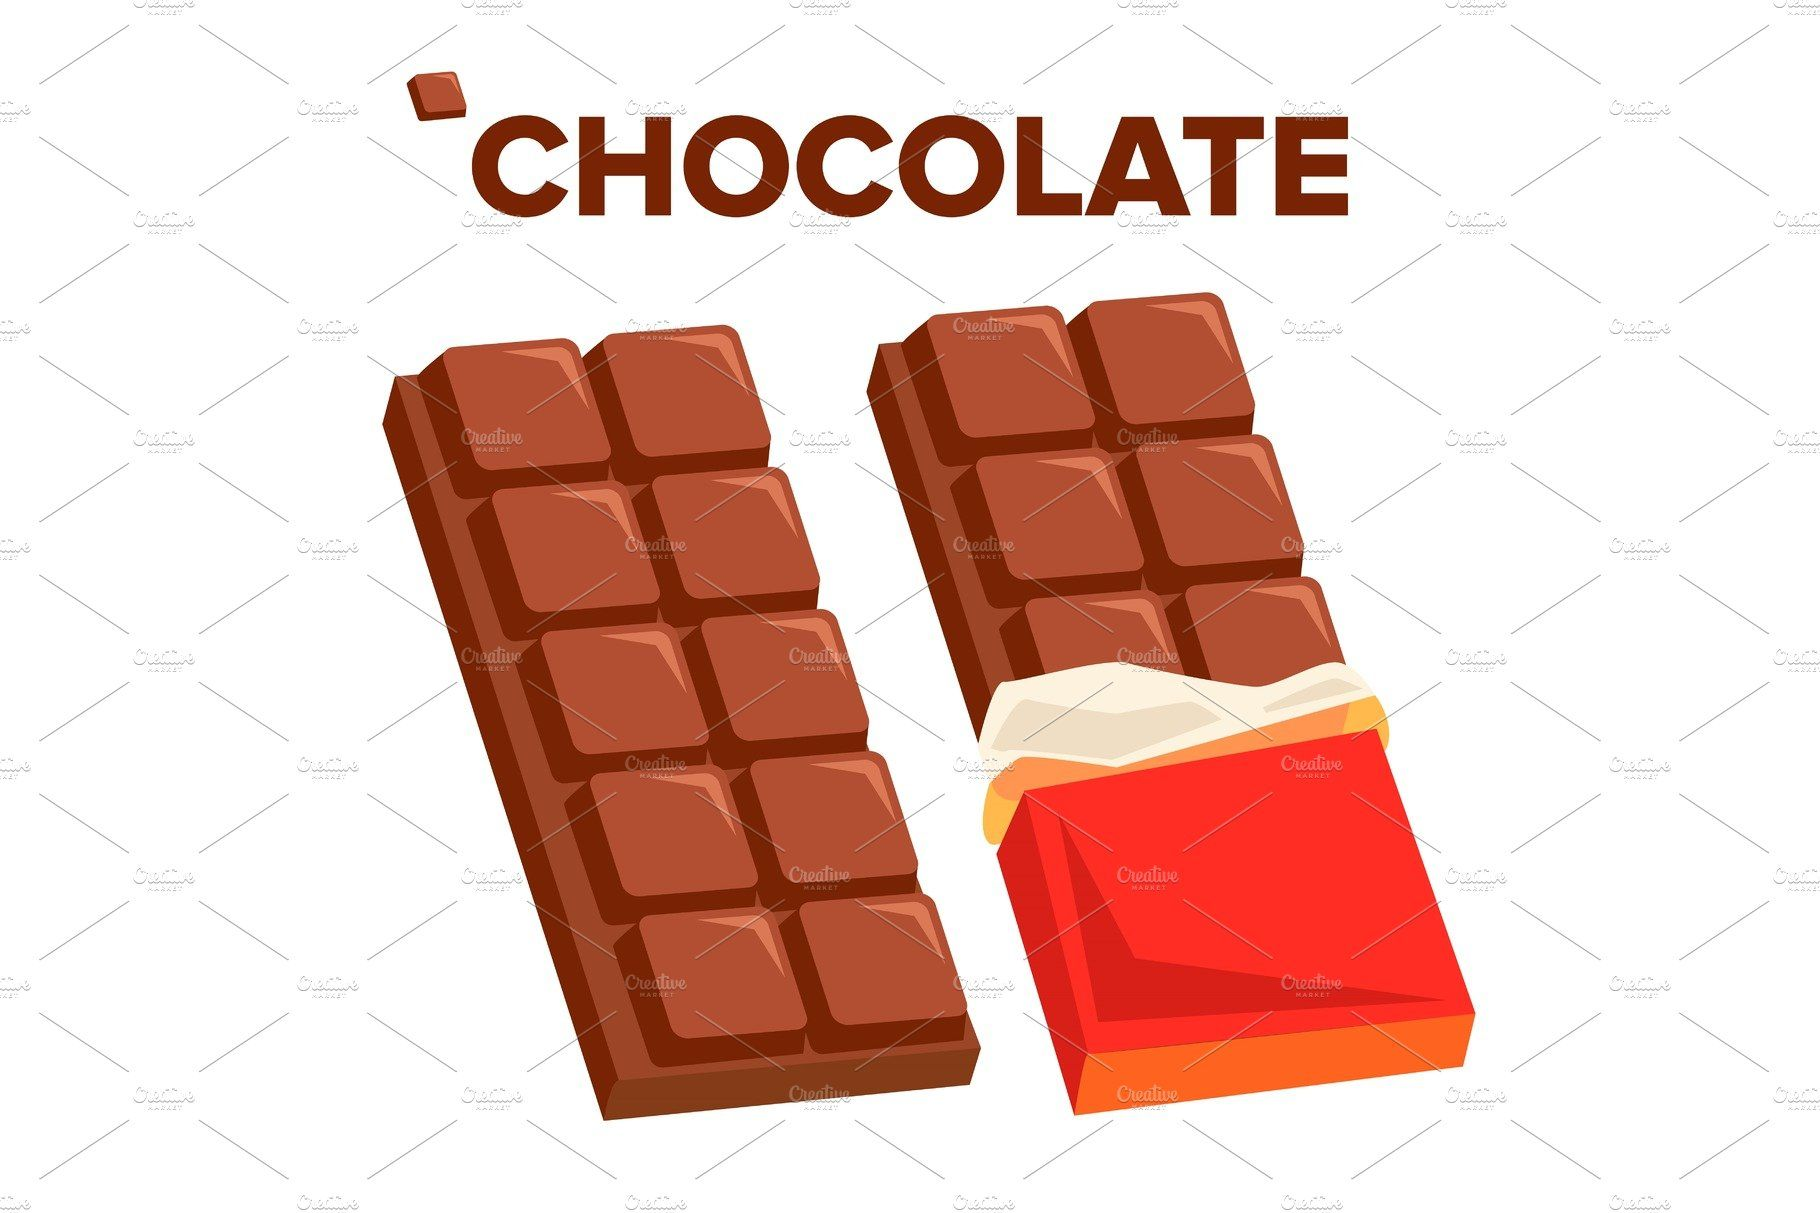 Chocolate Bar Icon Vector Dark Chocolate Bar Chocolate Cupcake Images